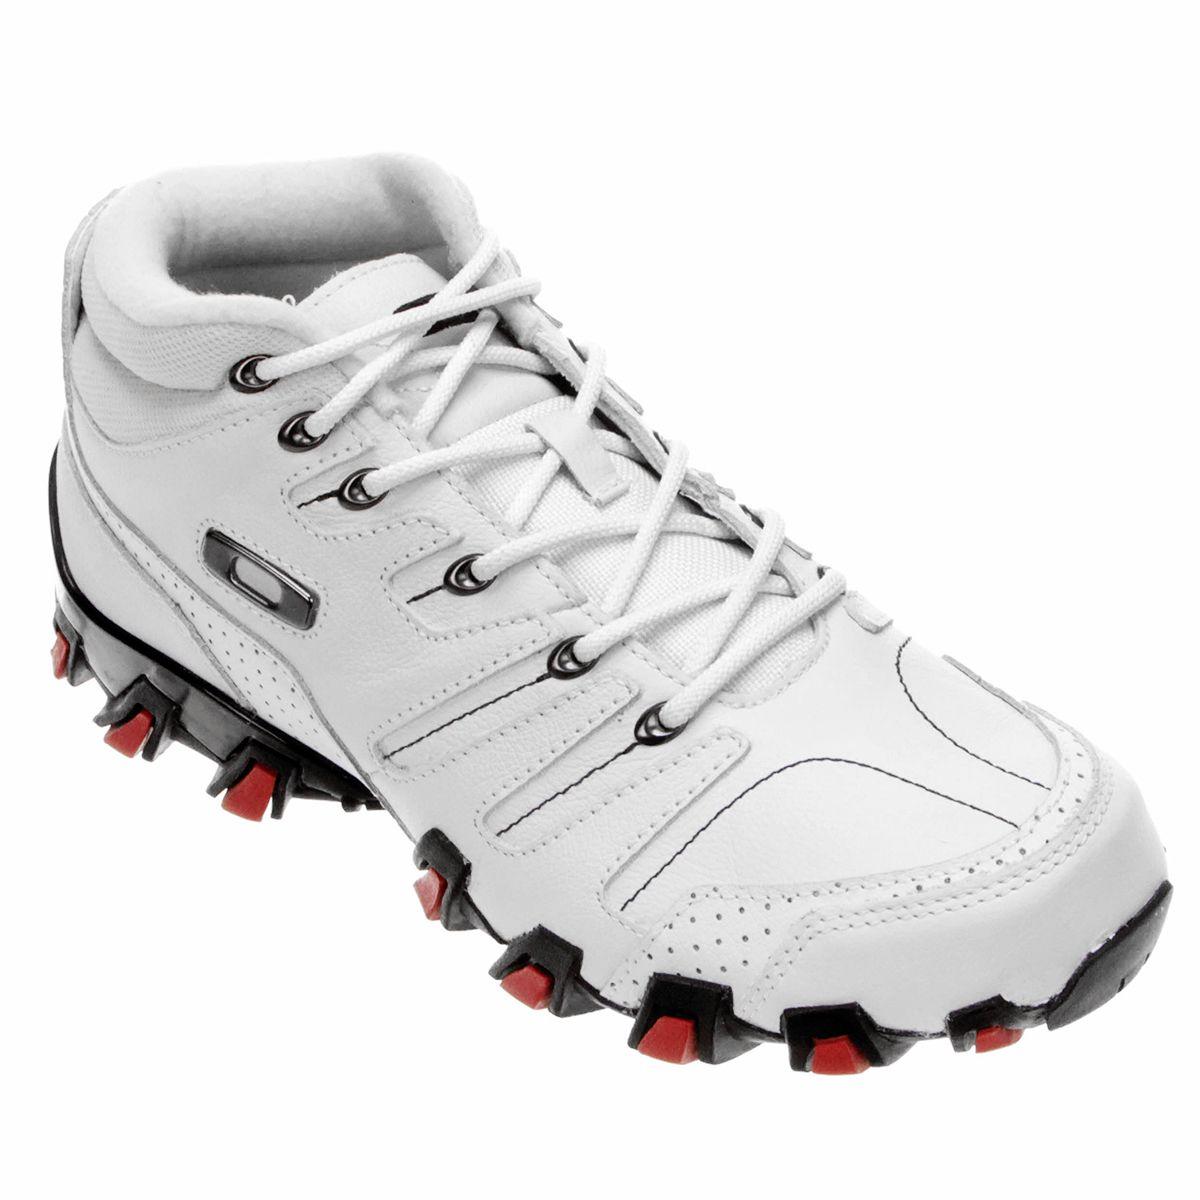 c172ff7661740 Tênis Oakley Hammer - Cinza+Vermelho   man k. em 2019   Hype shoes, Shoes e  Oakley shoes